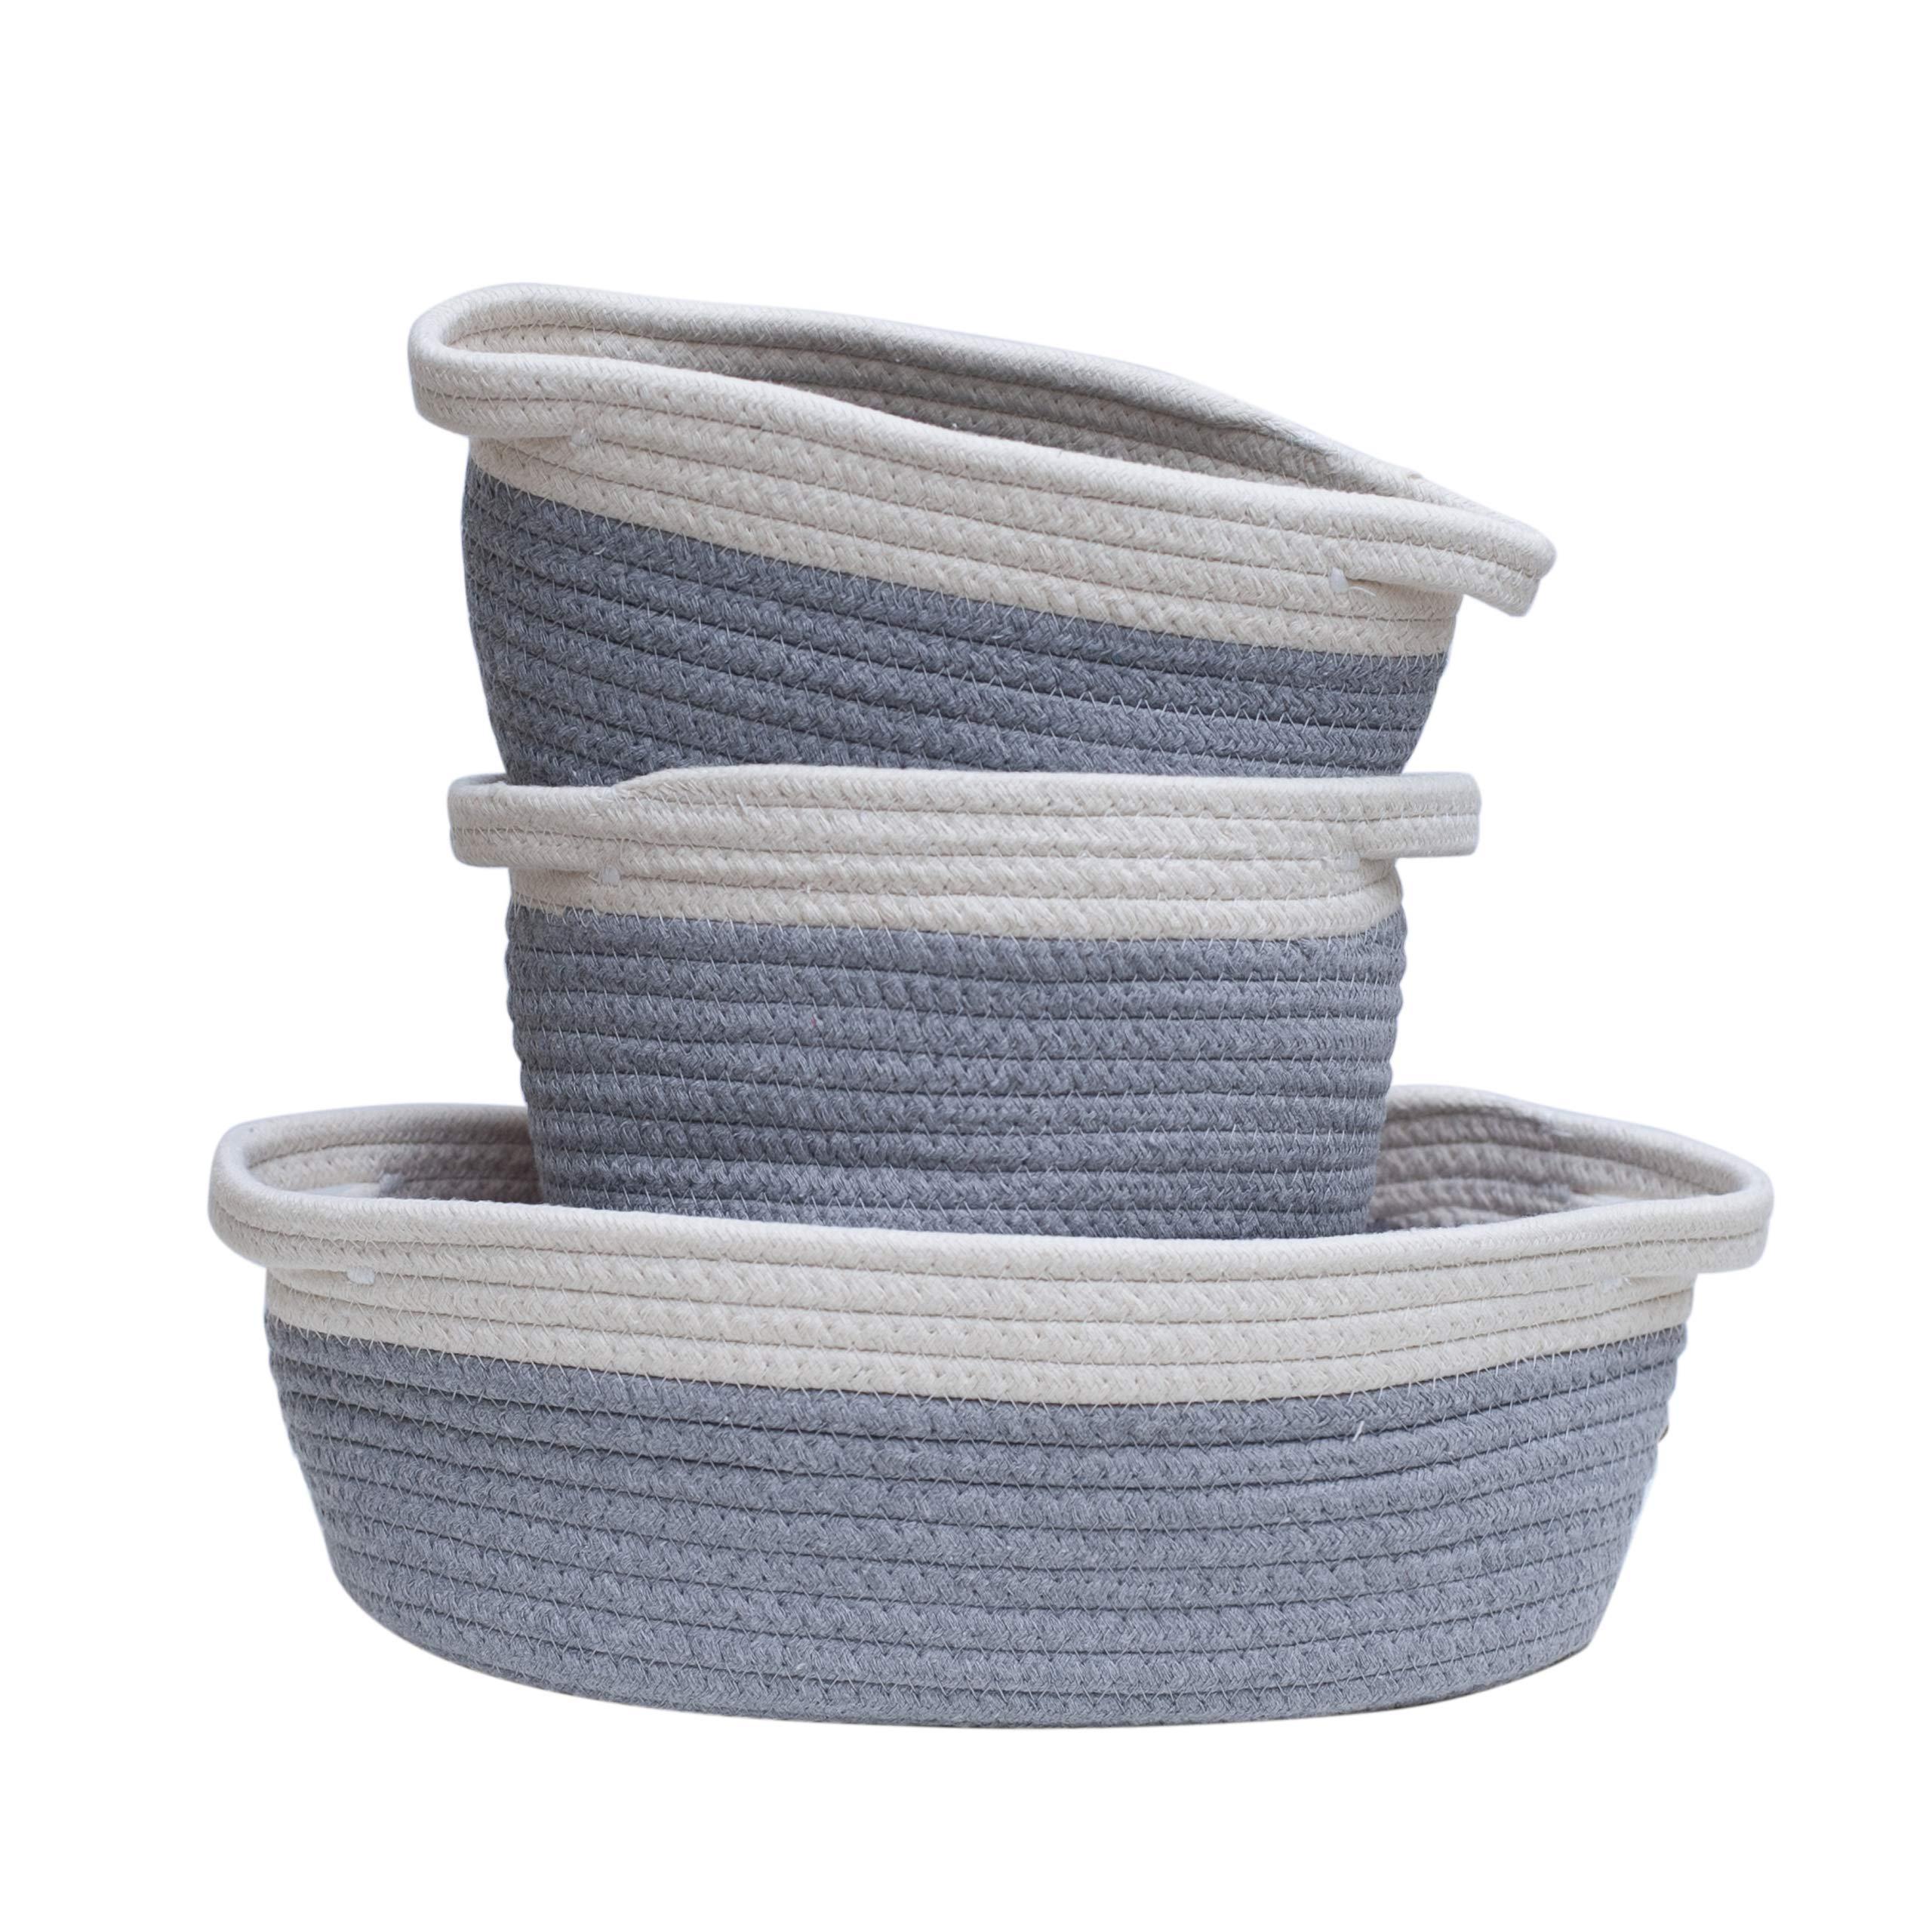 Mila Millie Cotton Rope Woven Baskets | Set of 3 Storage Organizer | Modern Chic Design Baby Nursery Bin | Bibs, Toys, Diapers, Art Craft Supplies Holder | Shower Gift | Eco Friendly (White & Gray) by Mila Millie